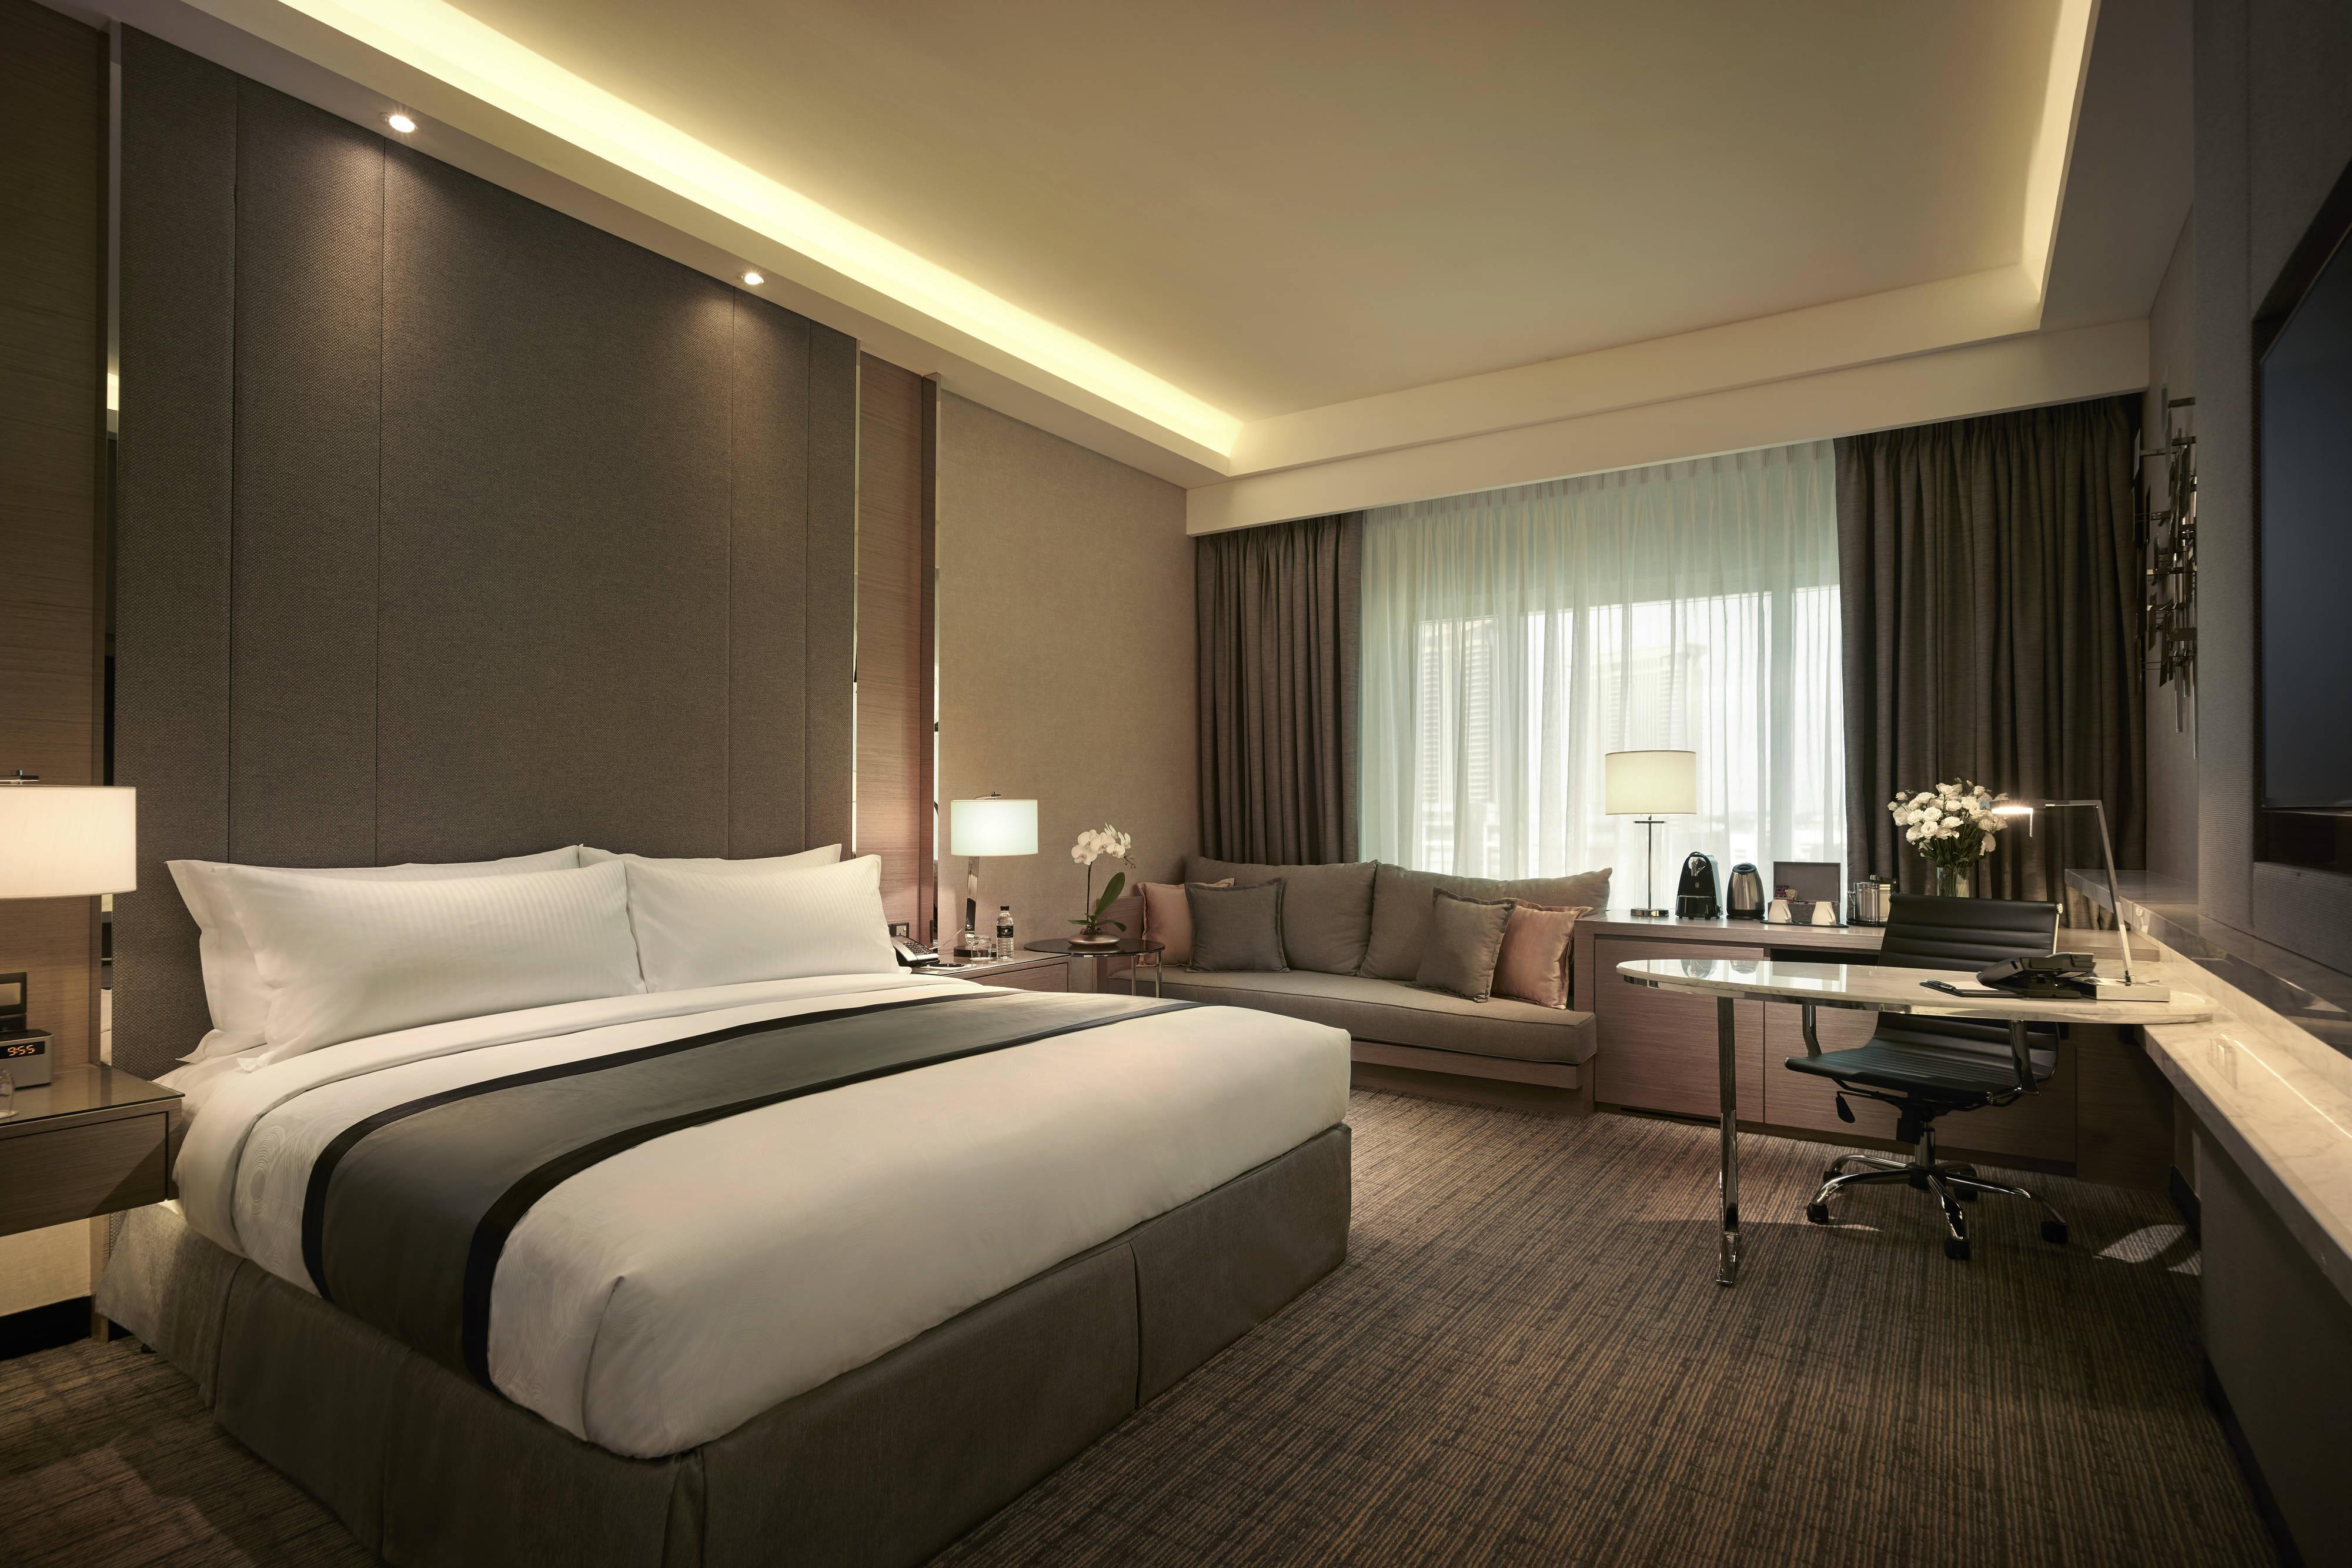 JW Marriott Hotel Kuala Lumpur hotel amenities | Hotel room highlights